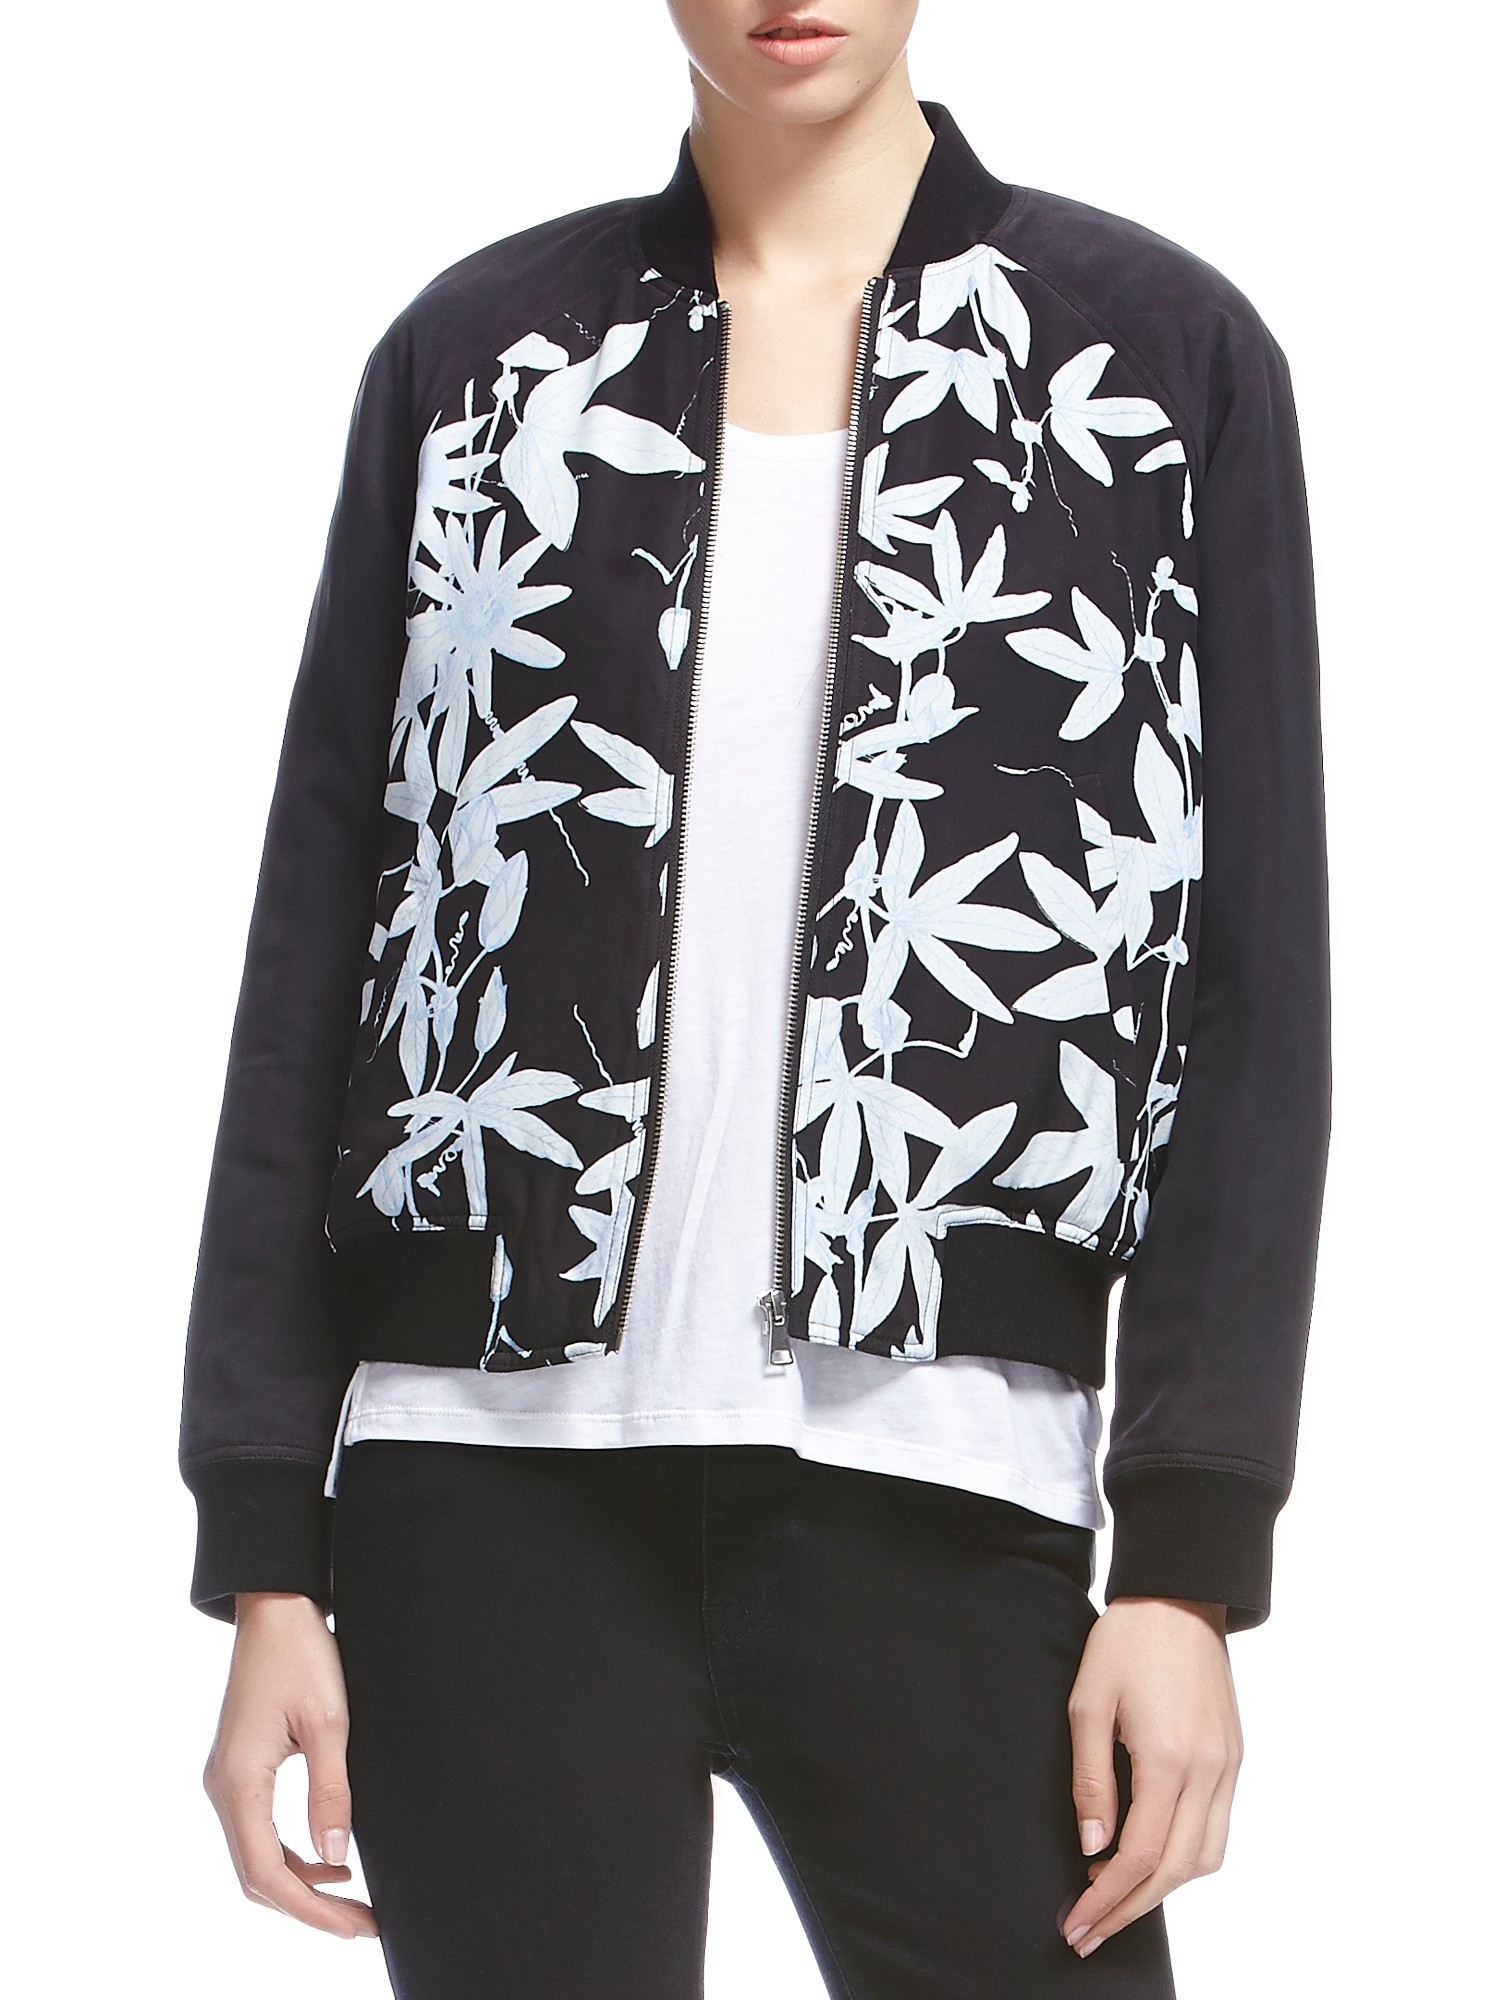 Silk bomber jacket whistles